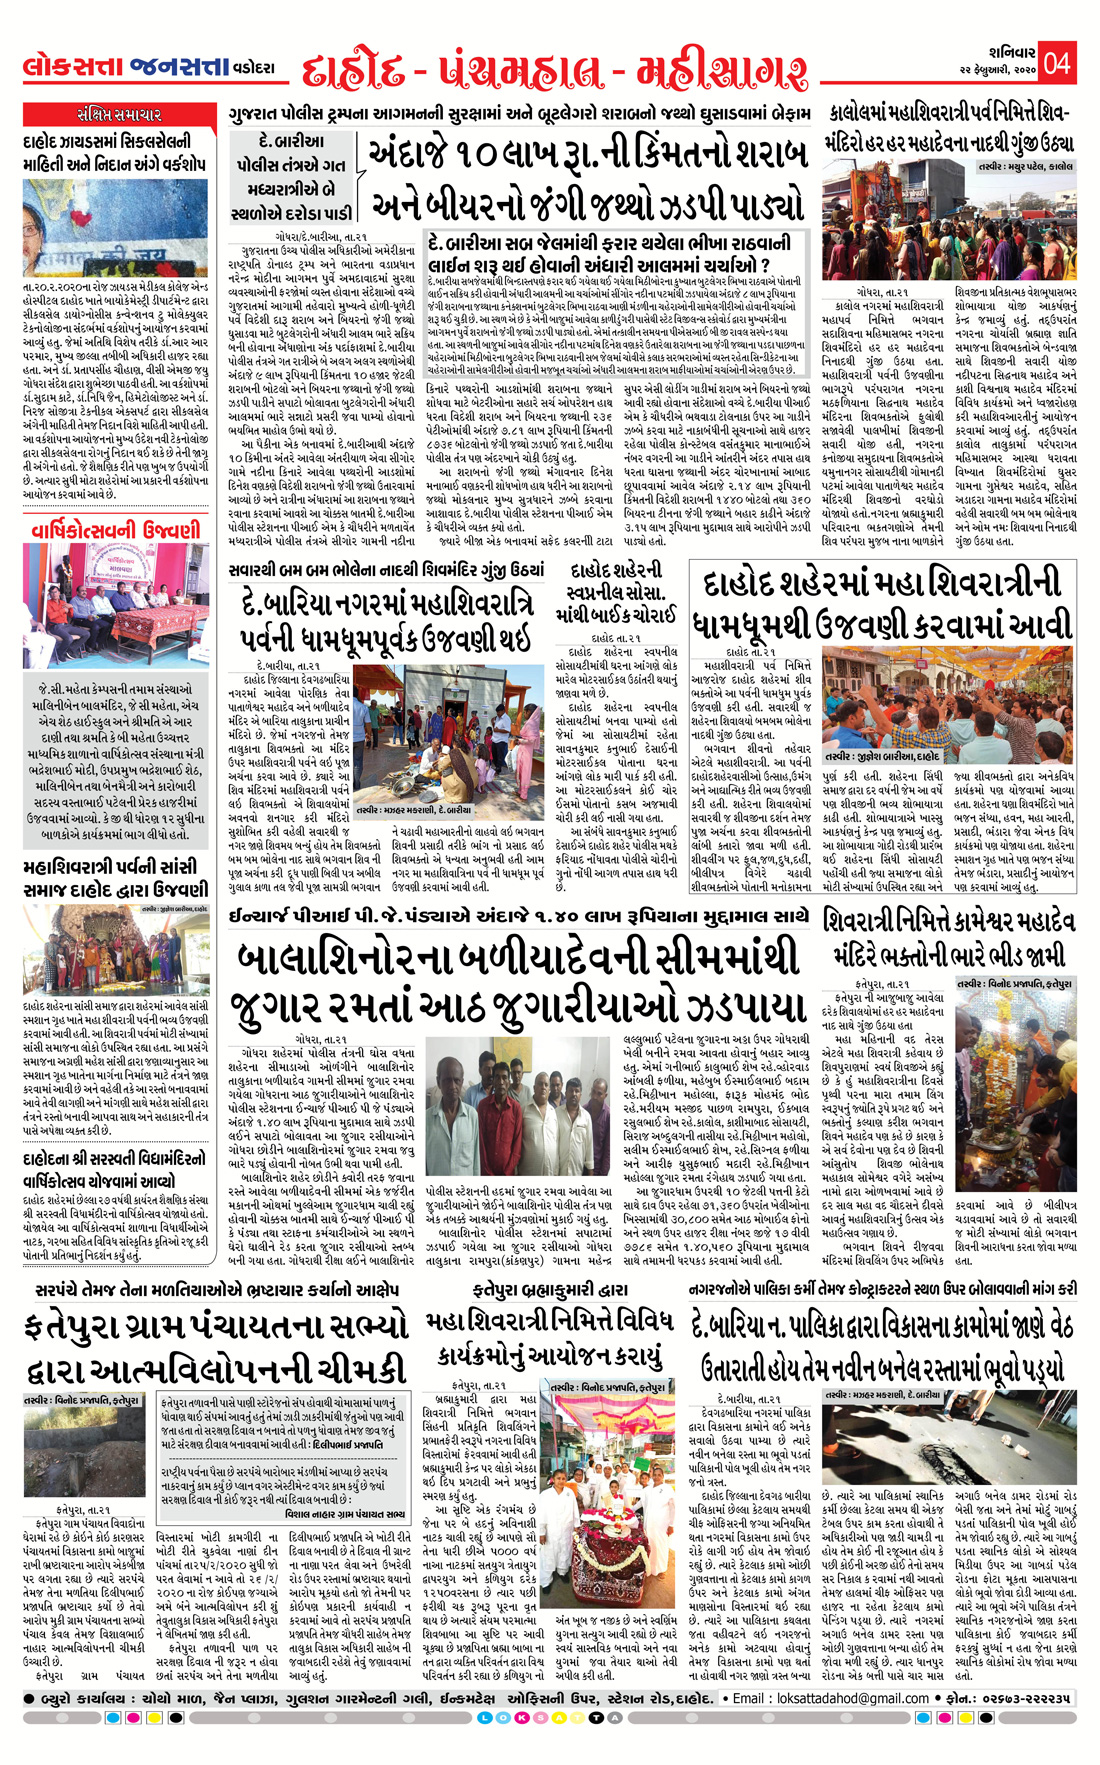 Loksatta Jansatta News Papaer E-paper dated 2020-02-22 | Page 4